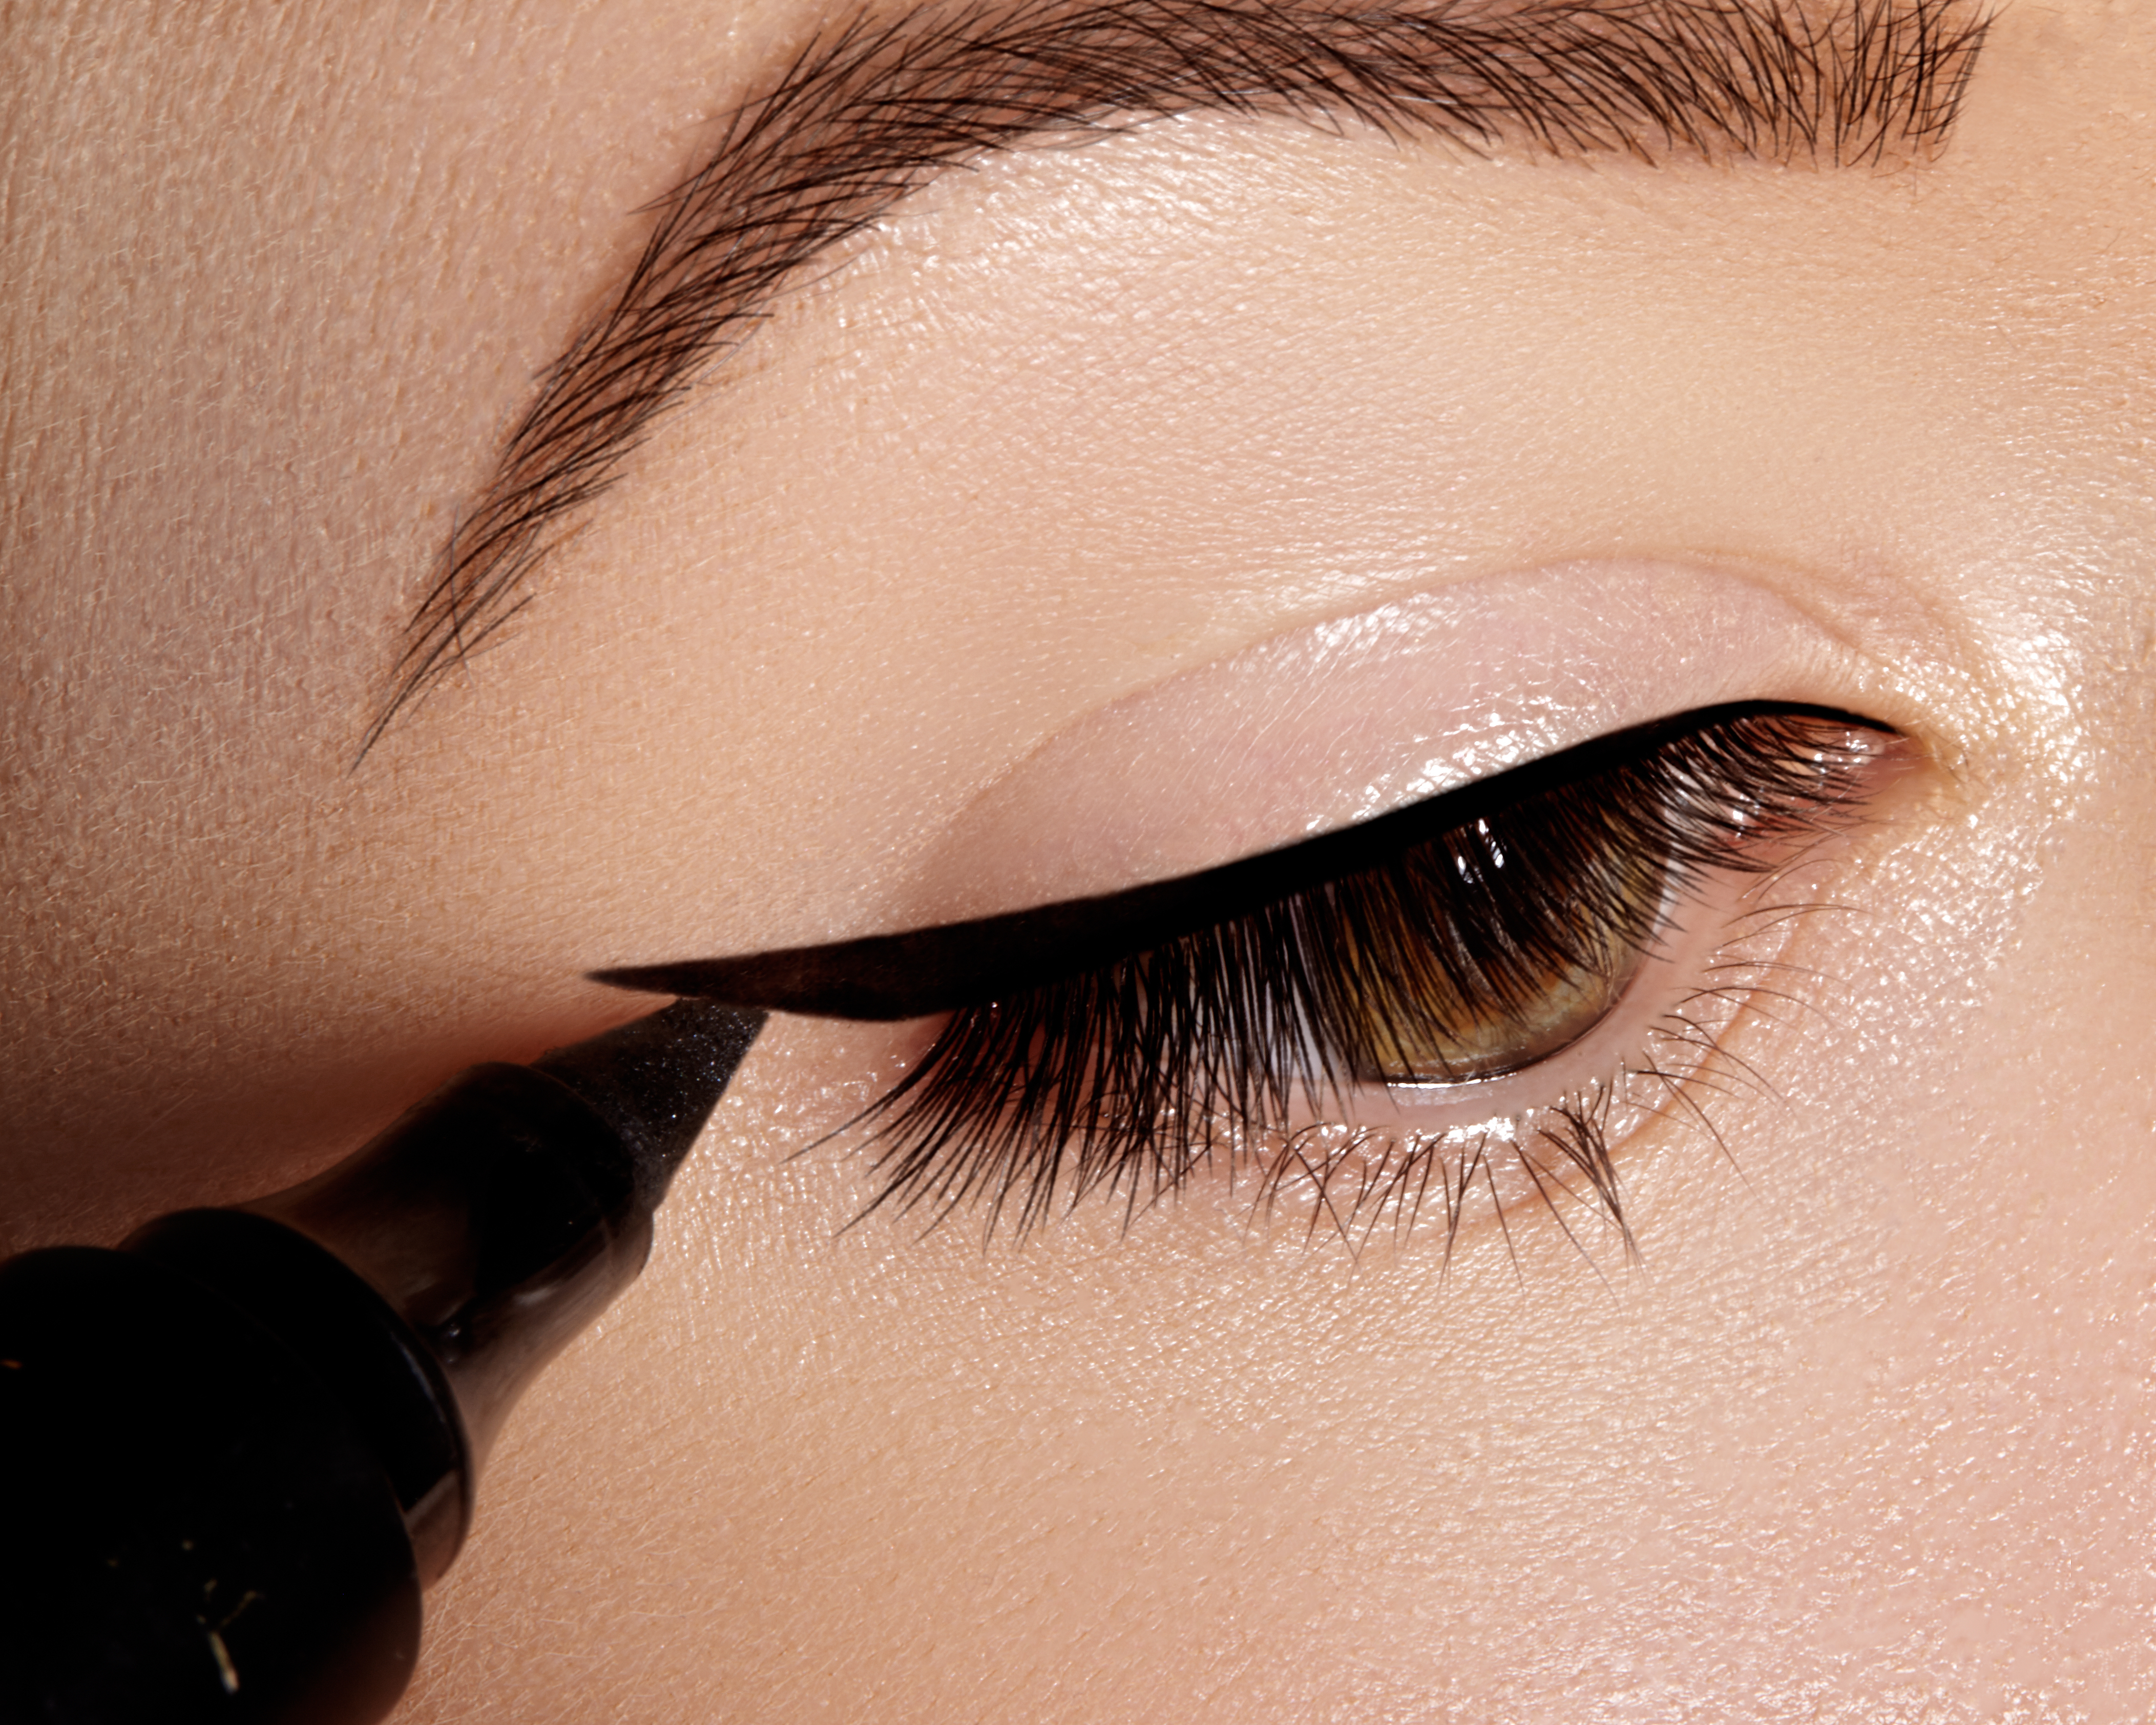 BeLashes & Microblading 32003 | Permanent Makeup